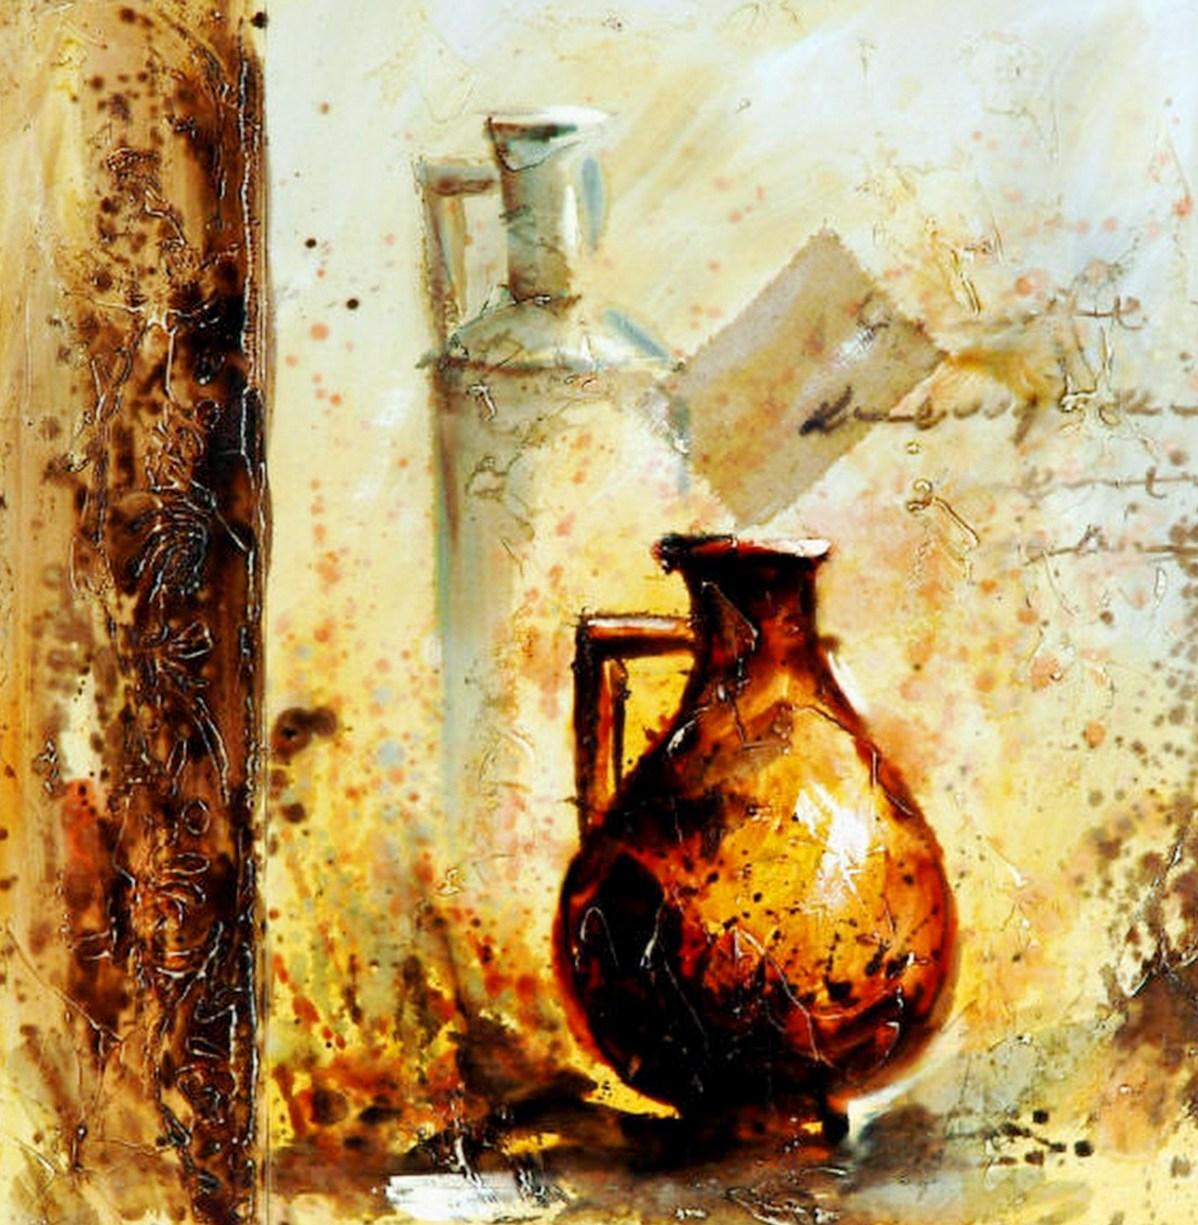 Im genes arte pinturas bodegones modernos - Pinturas bodegones modernos ...